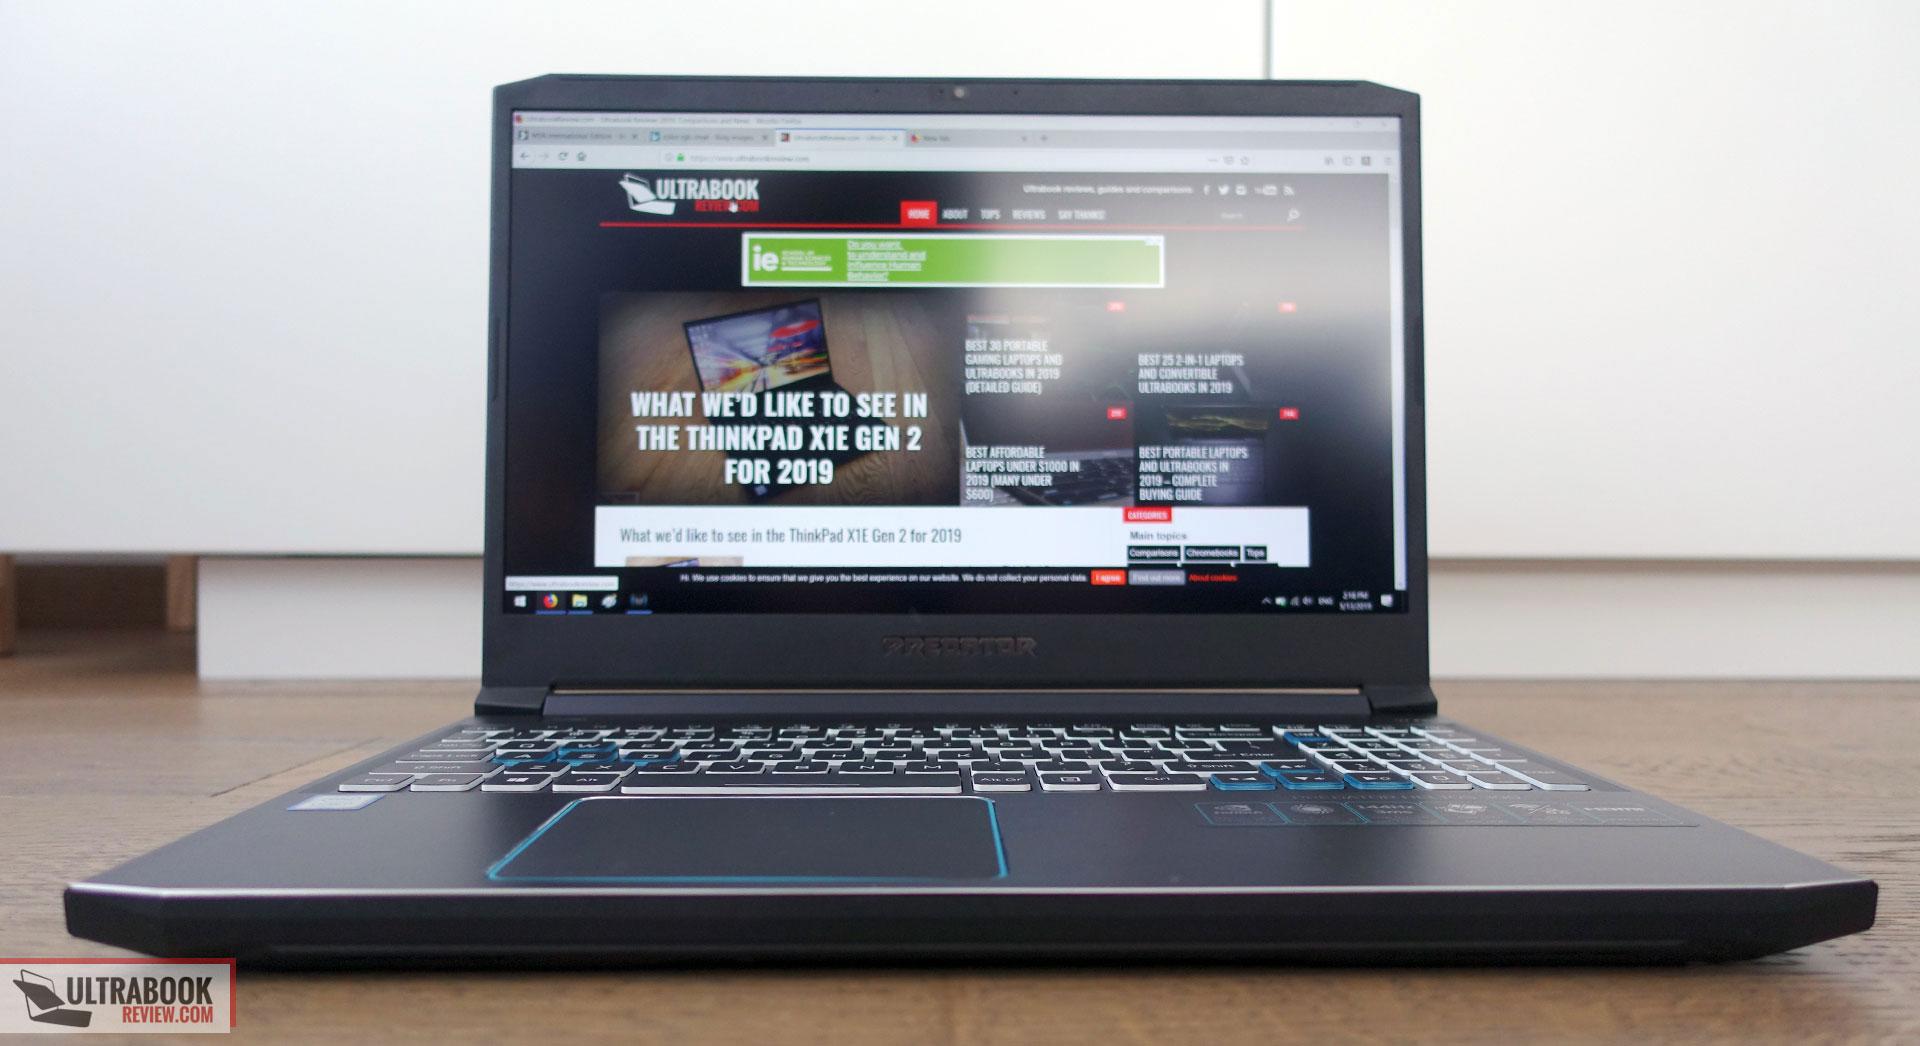 Acer Predator Helios 300 review (15-inch PH315-52 2019 model